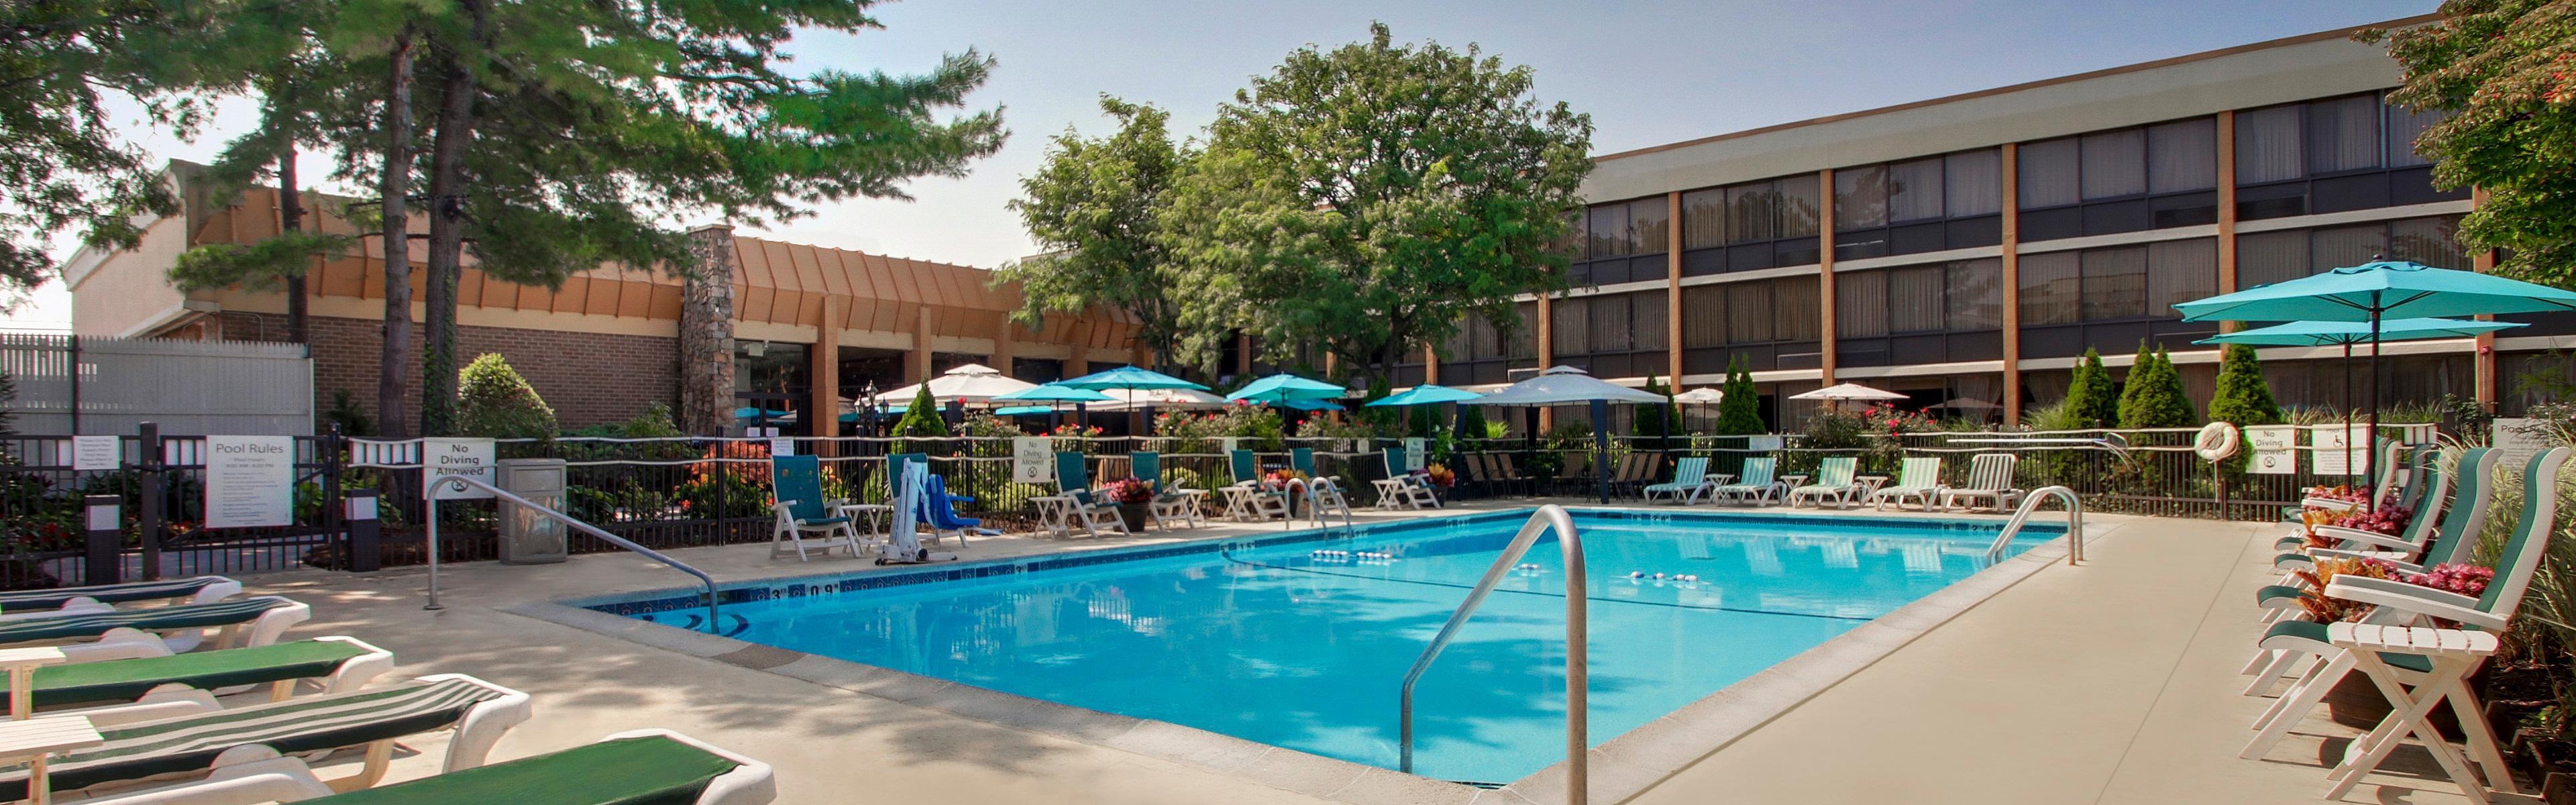 Holiday Inn Westbury-Long Island image 2